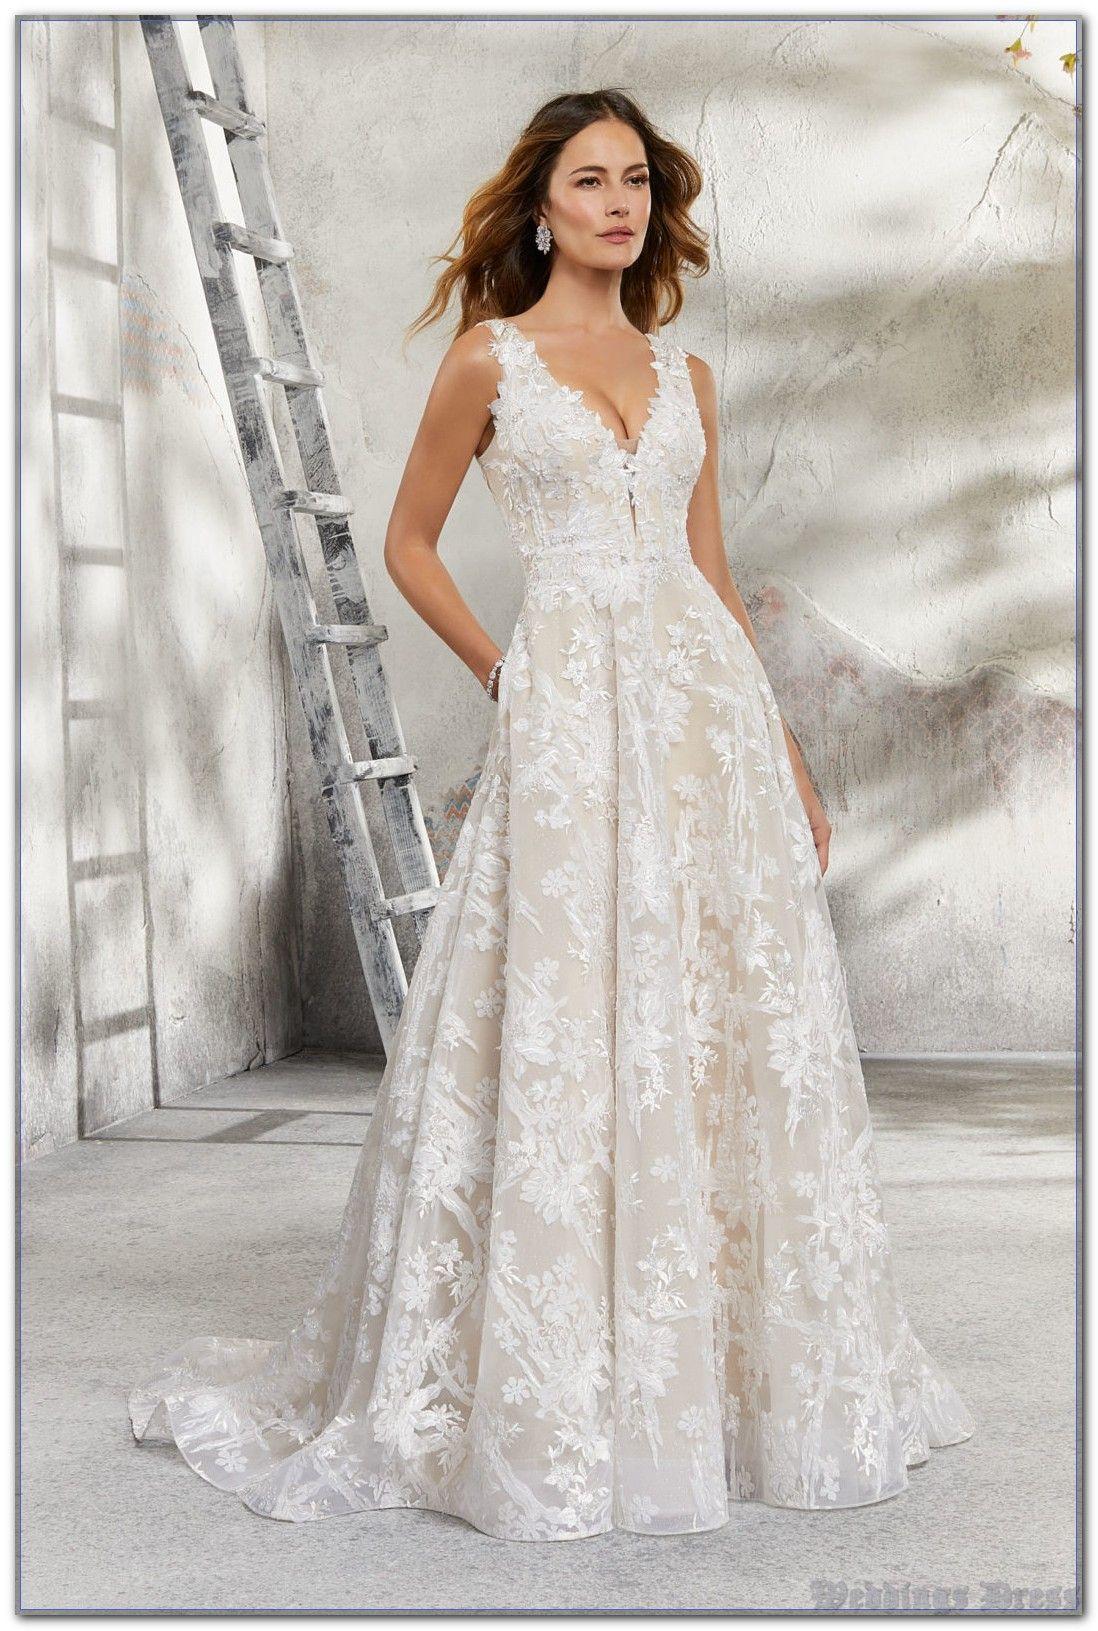 Why Weddings Dress Succeeds